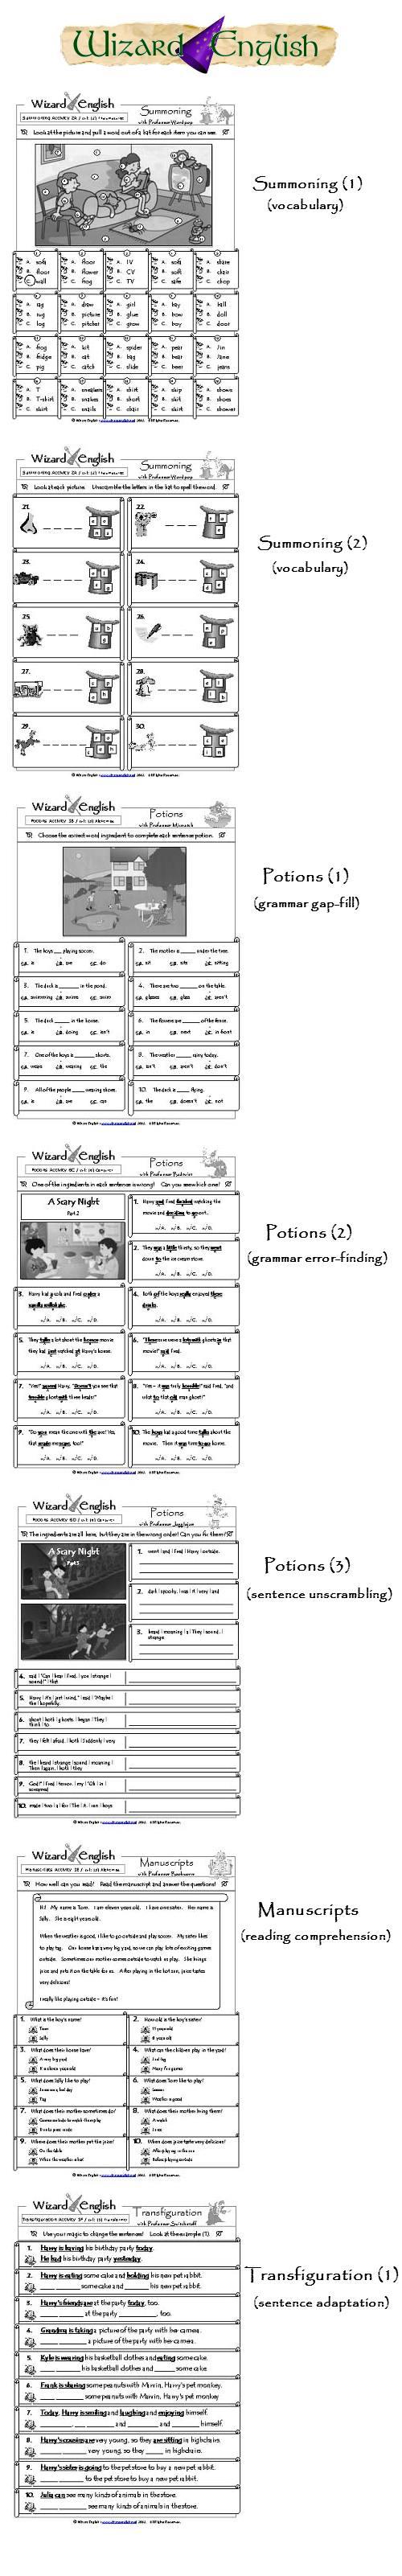 Er-blog-wizardenglish-task-examples